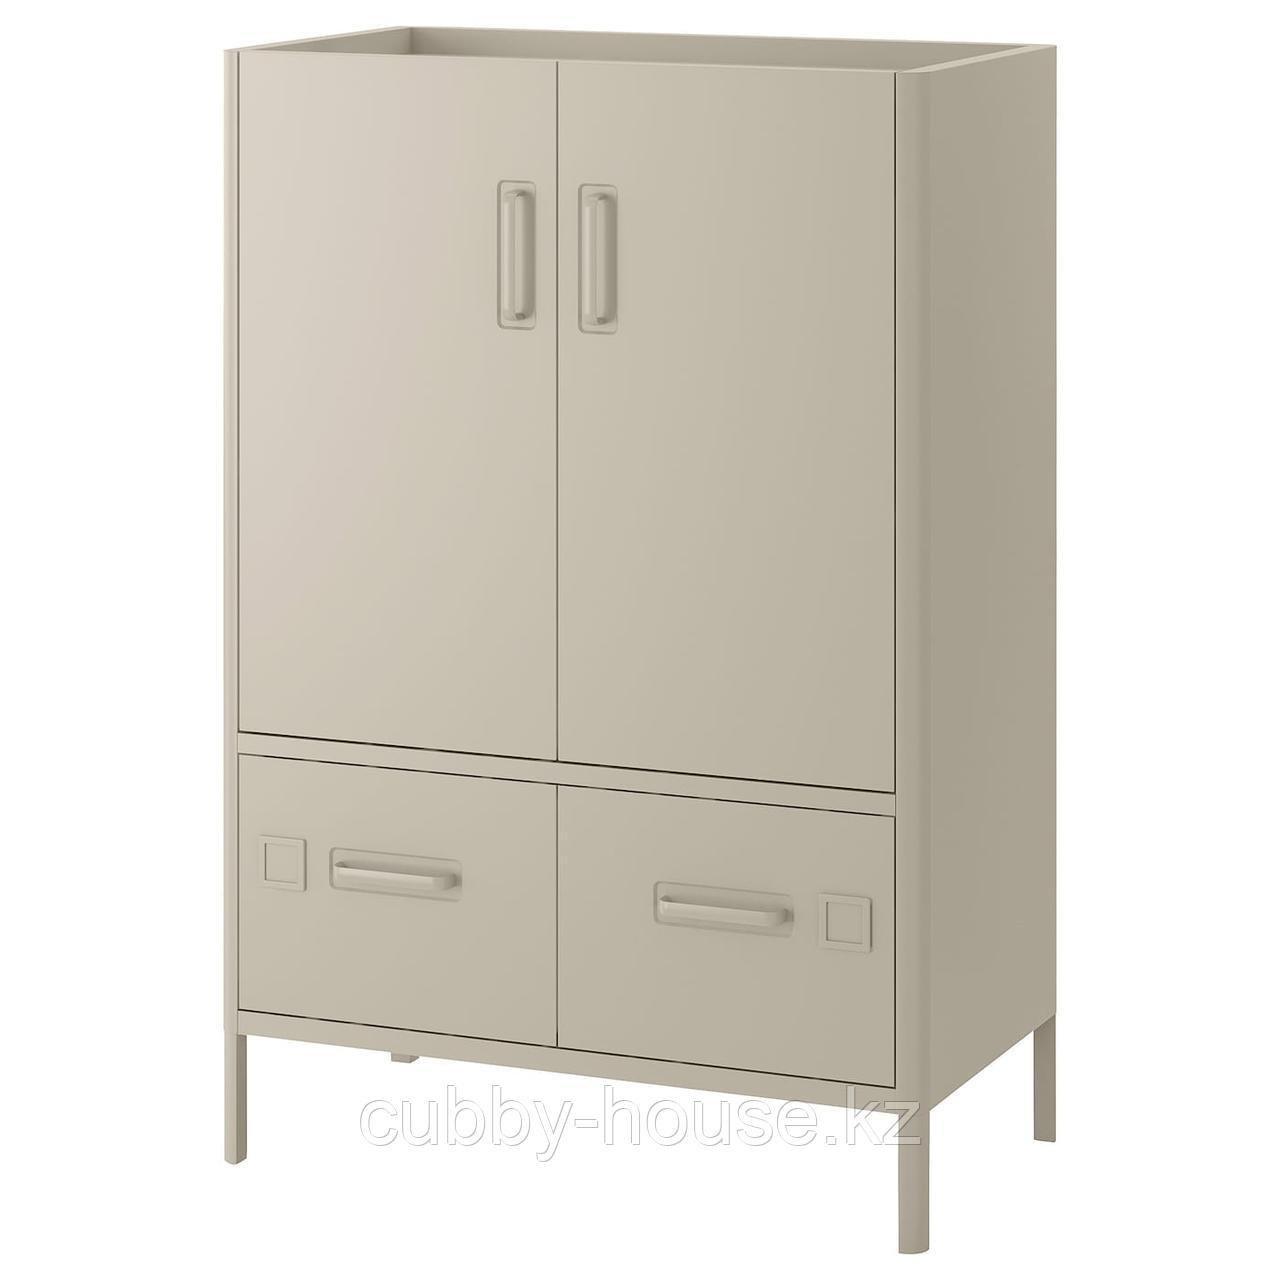 ИДОСЕН Шкаф с дверцами и ящиками, бежевый, 80x47x119 см